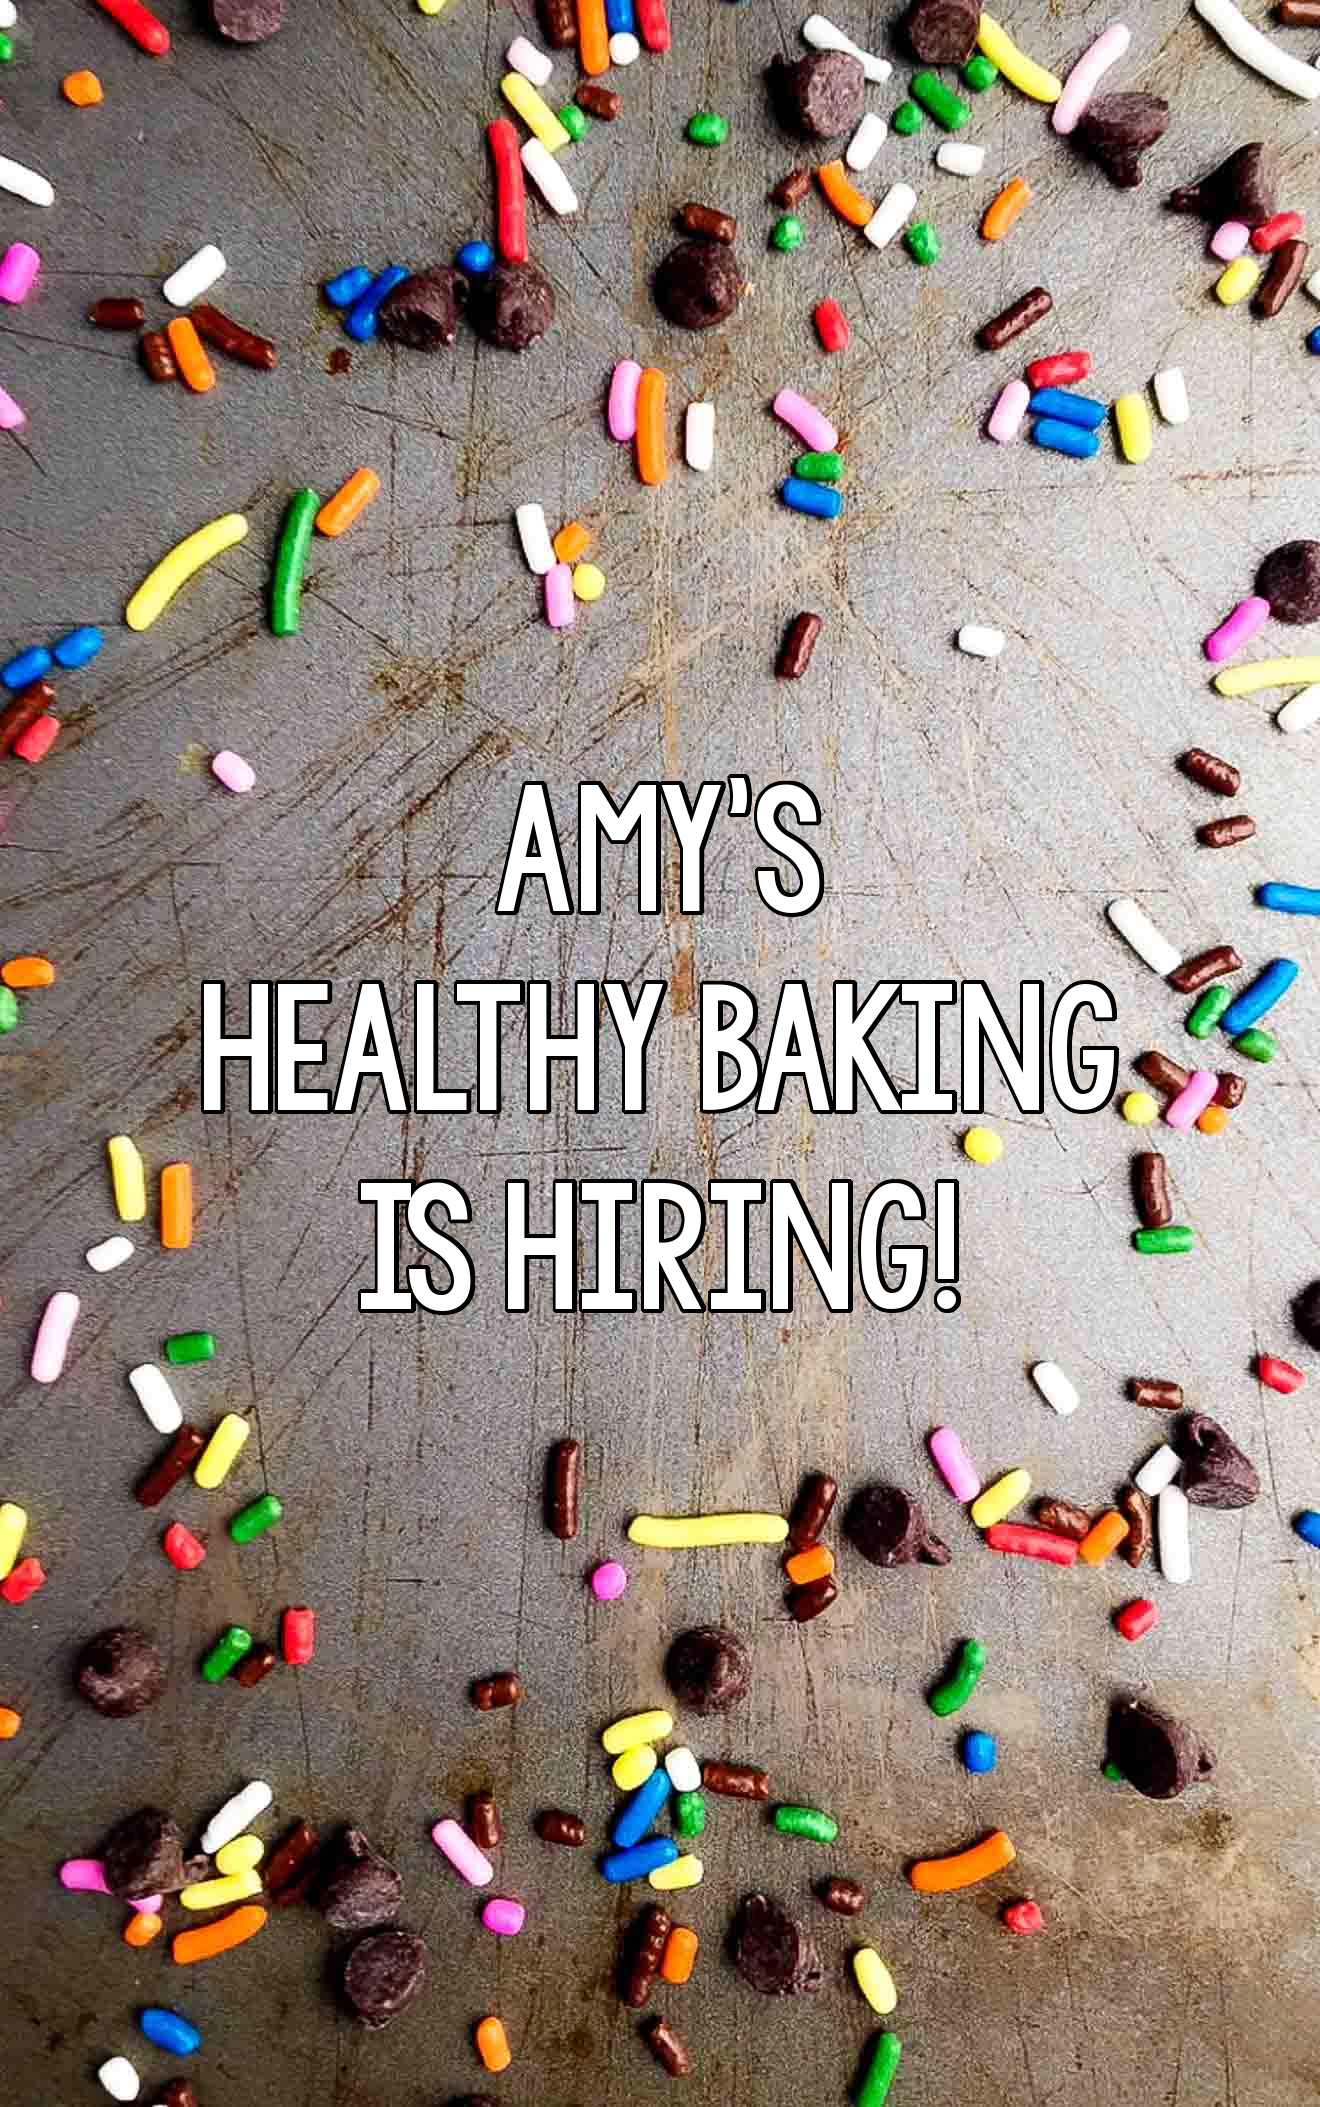 Amy's Healthy Baking is Hiring!